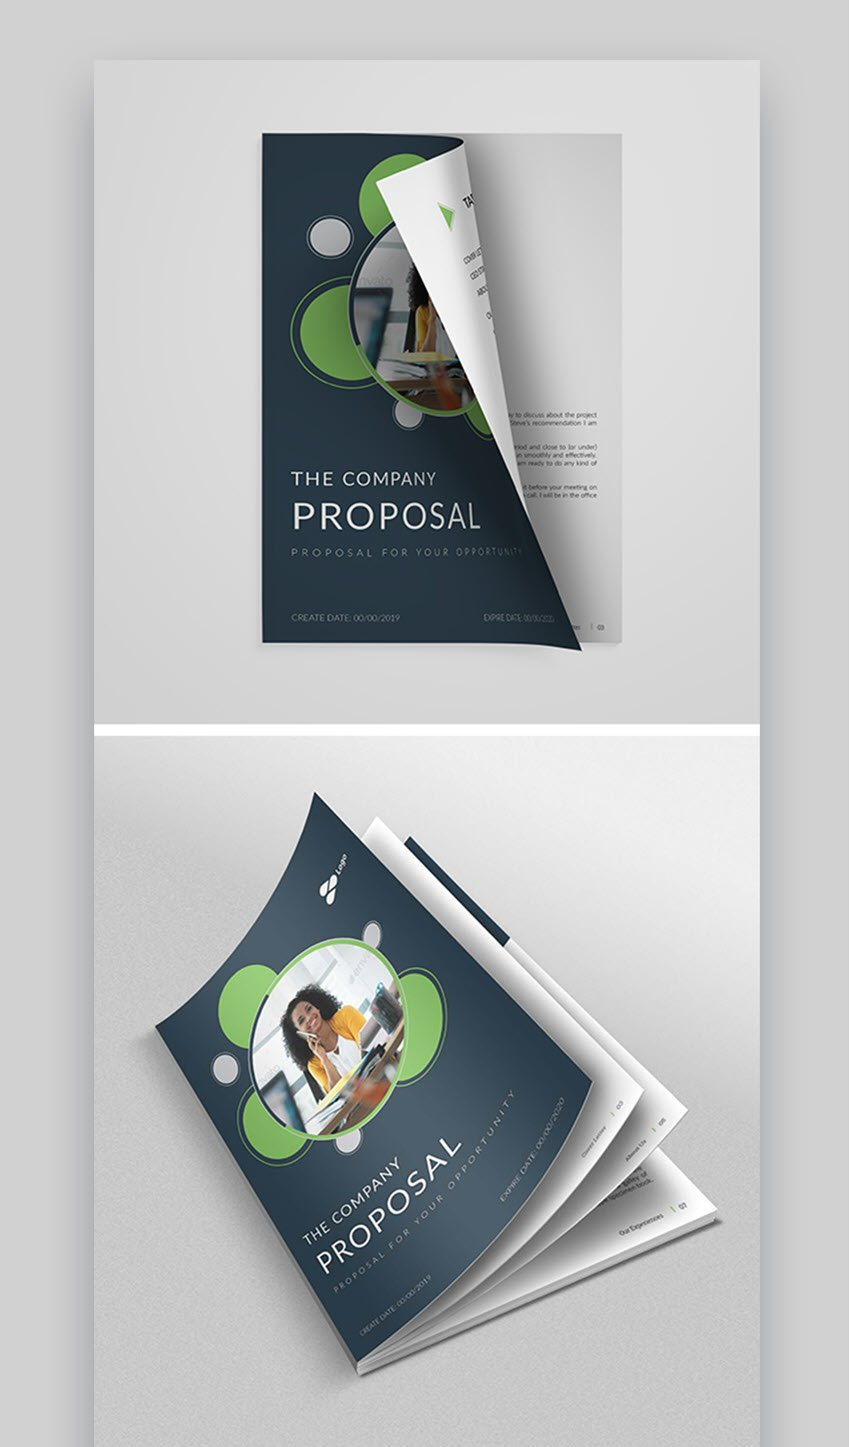 Proposal - asombrosa plantilla de propuesta profesional